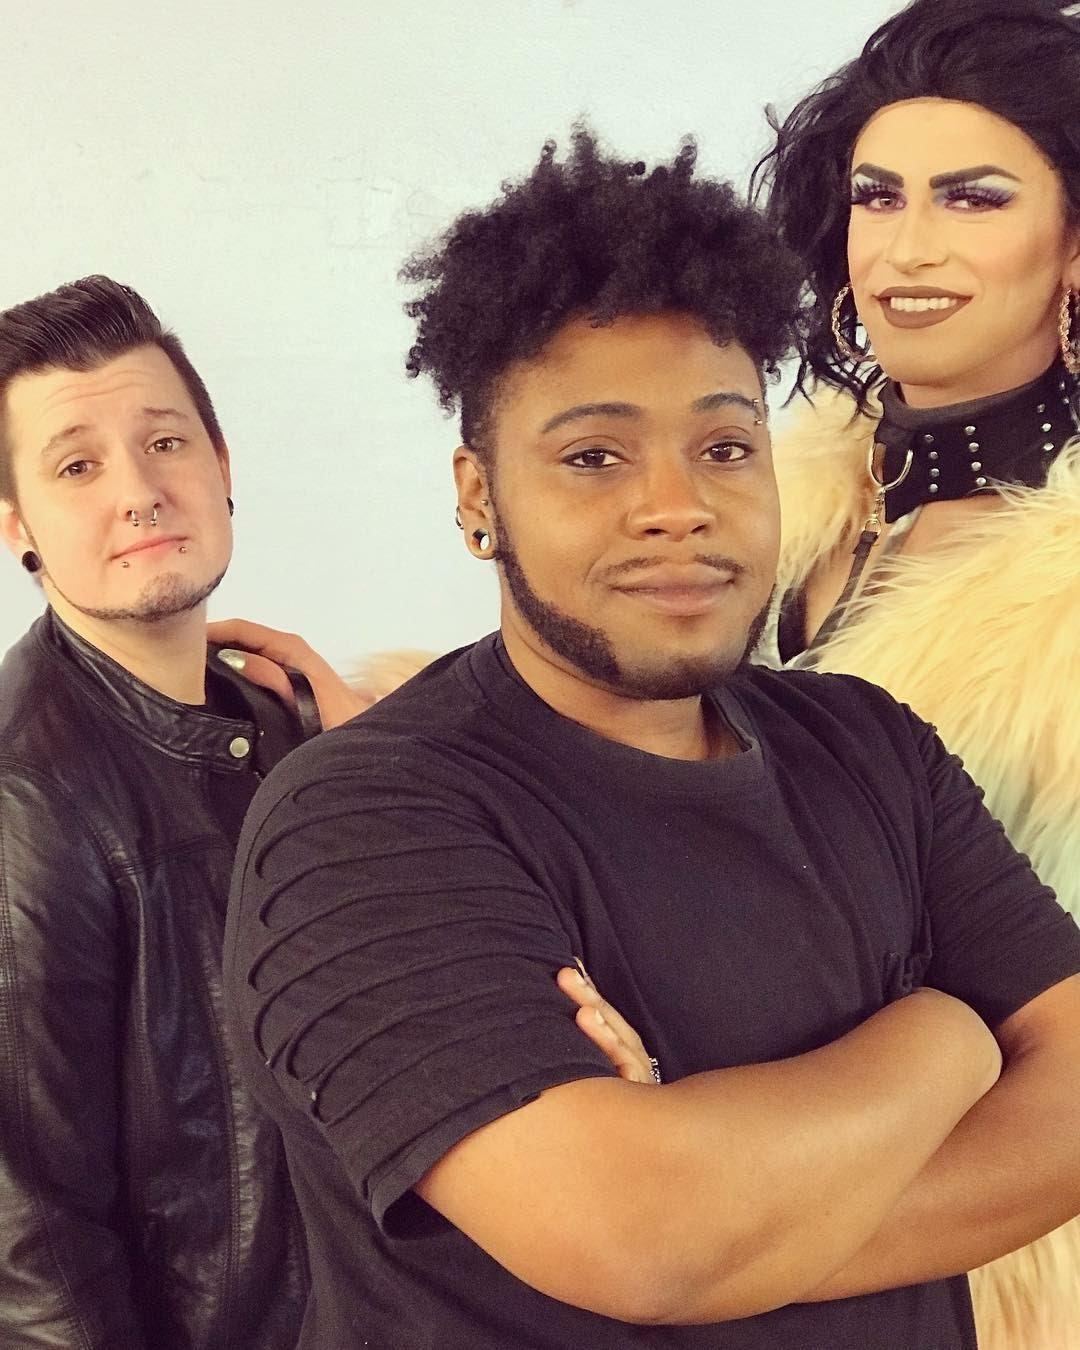 three gay people